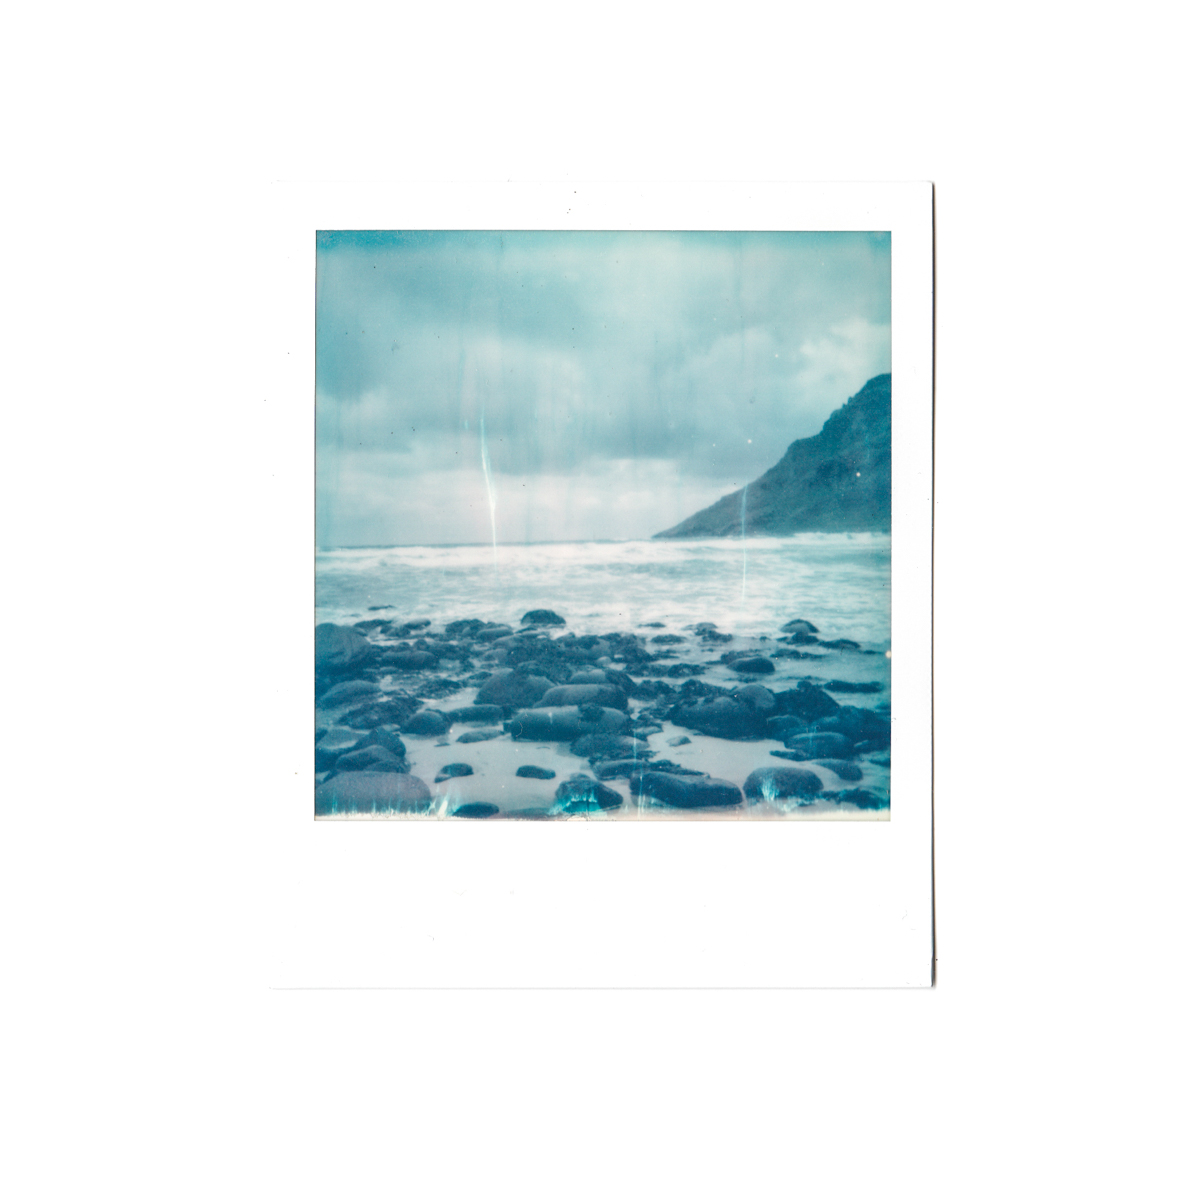 Magnolia_mountain_solvor_MT34-2.jpg